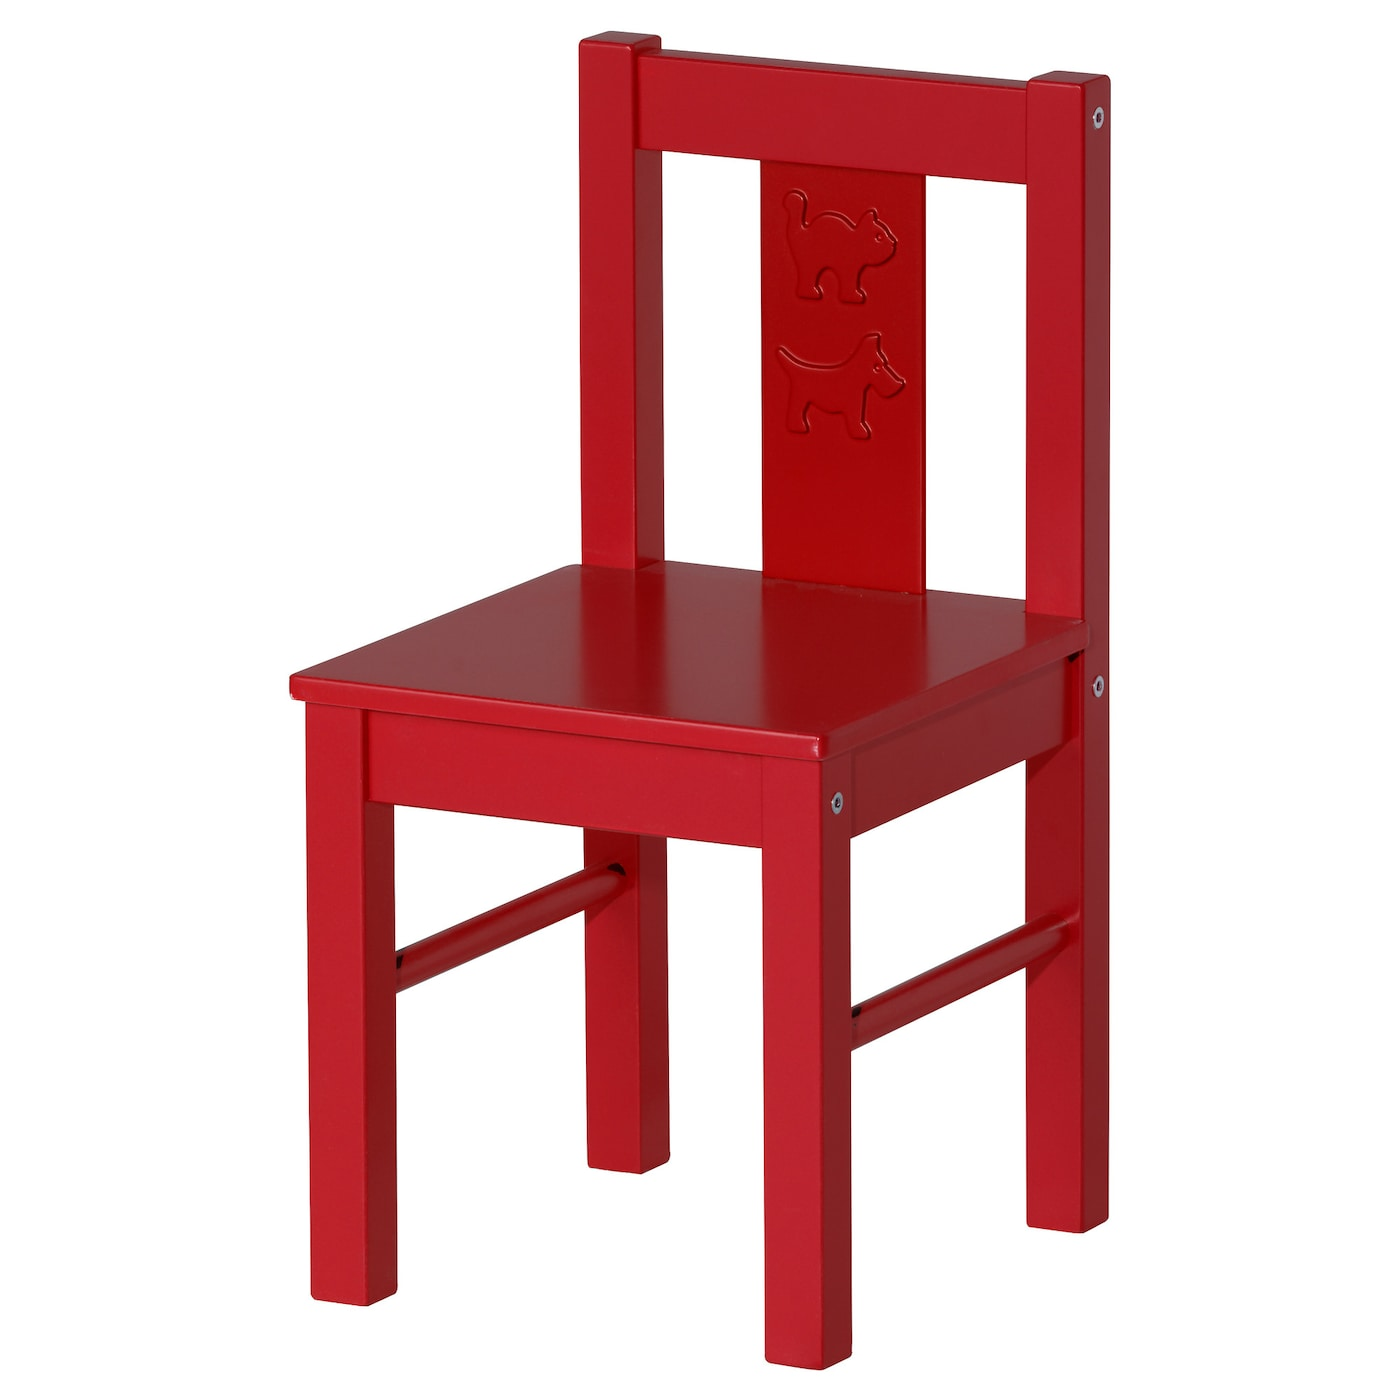 IKEA KRITTER Childrenu0027s Chair